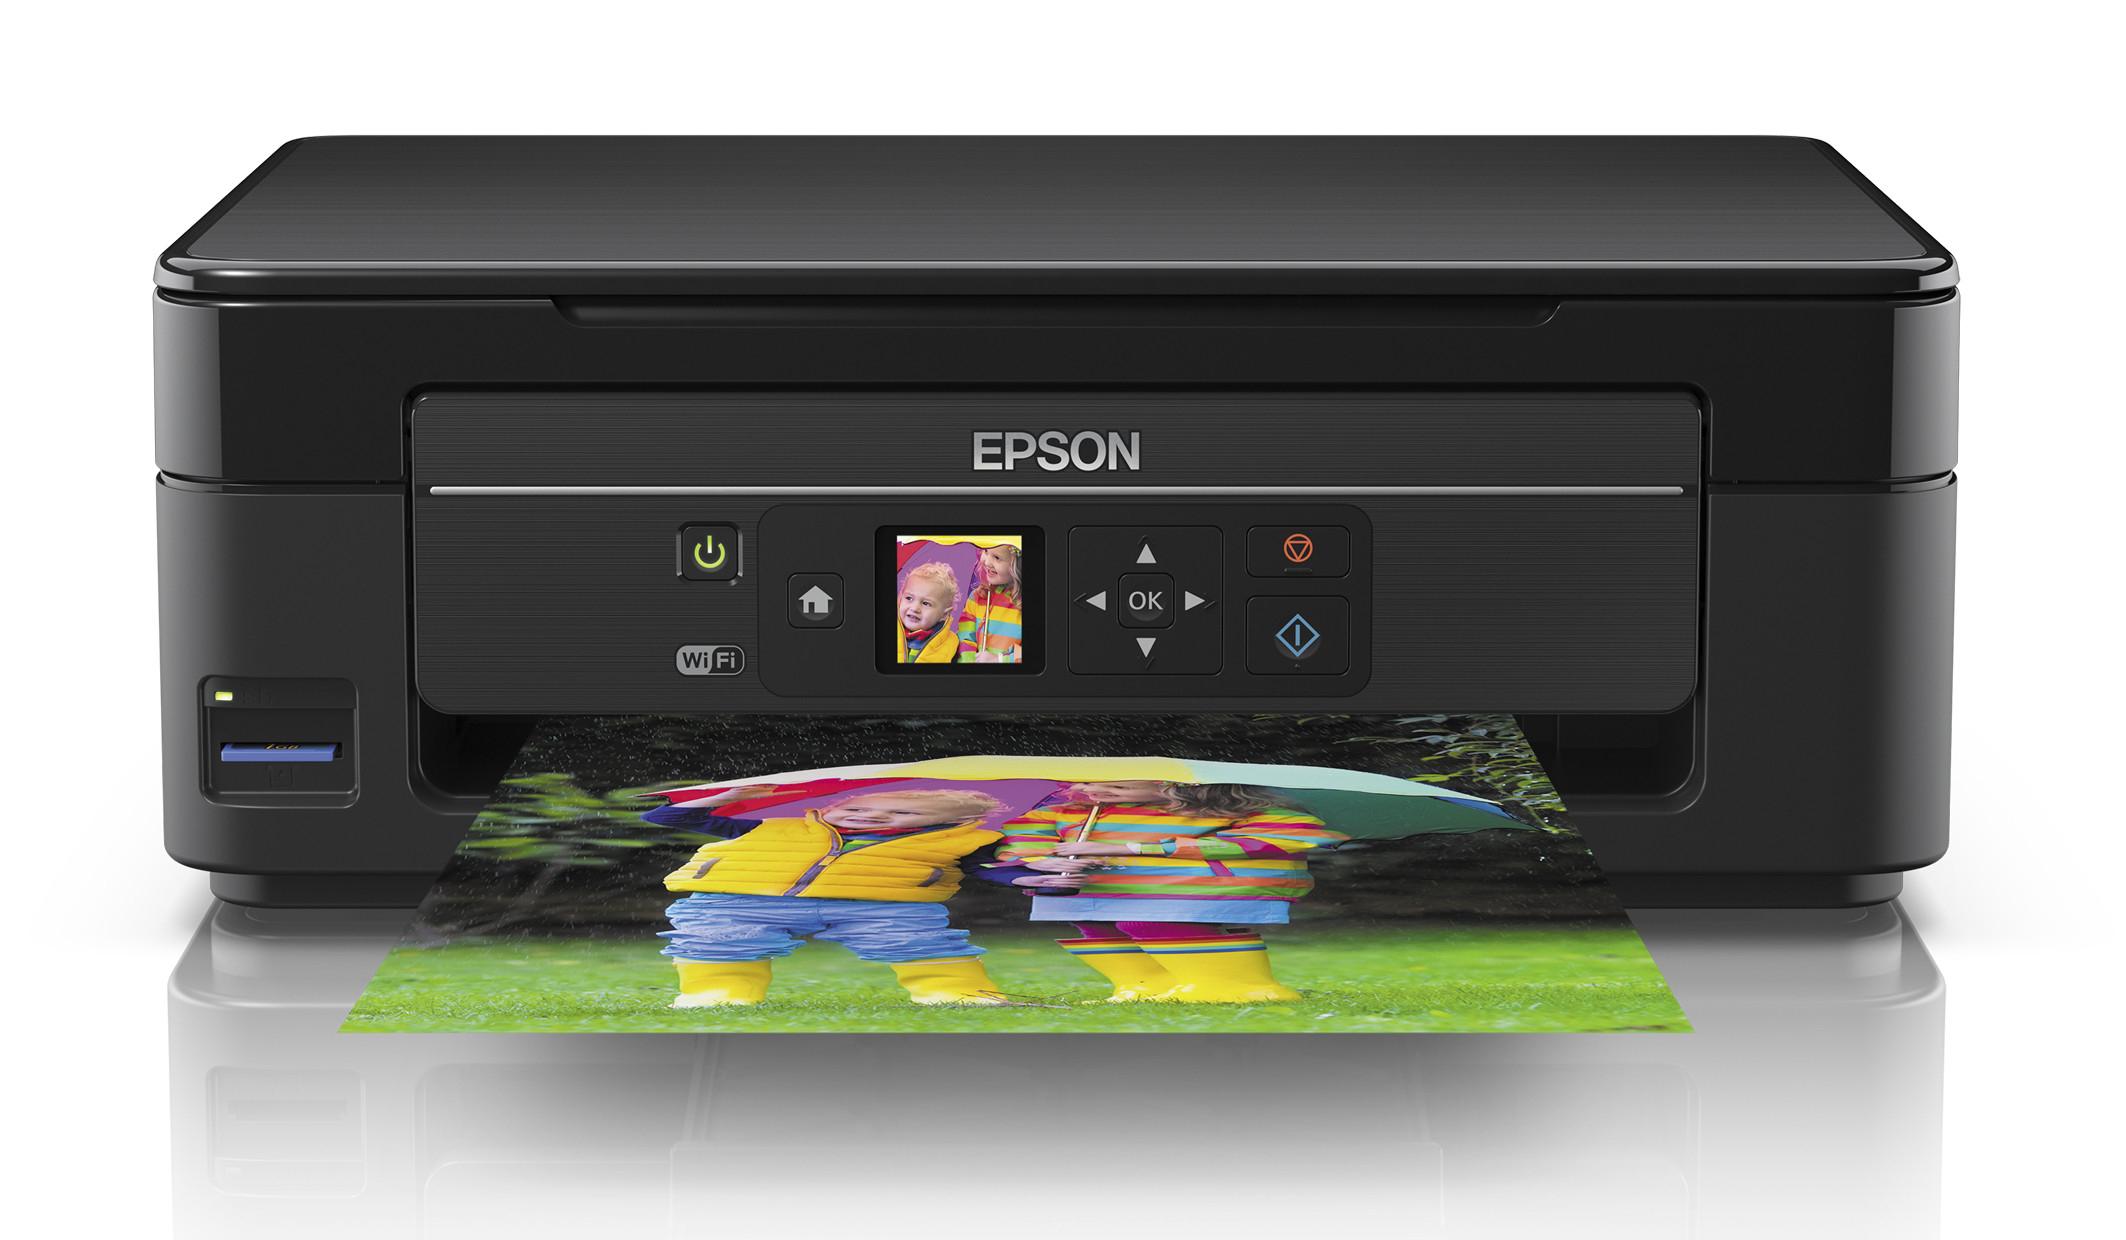 [LOKAL,Duisburg & Umgebung] Epson XP-3423 Multifunktionsdrucker (Wi-Fi Printing, Scannen, Kopieren & Drucken)